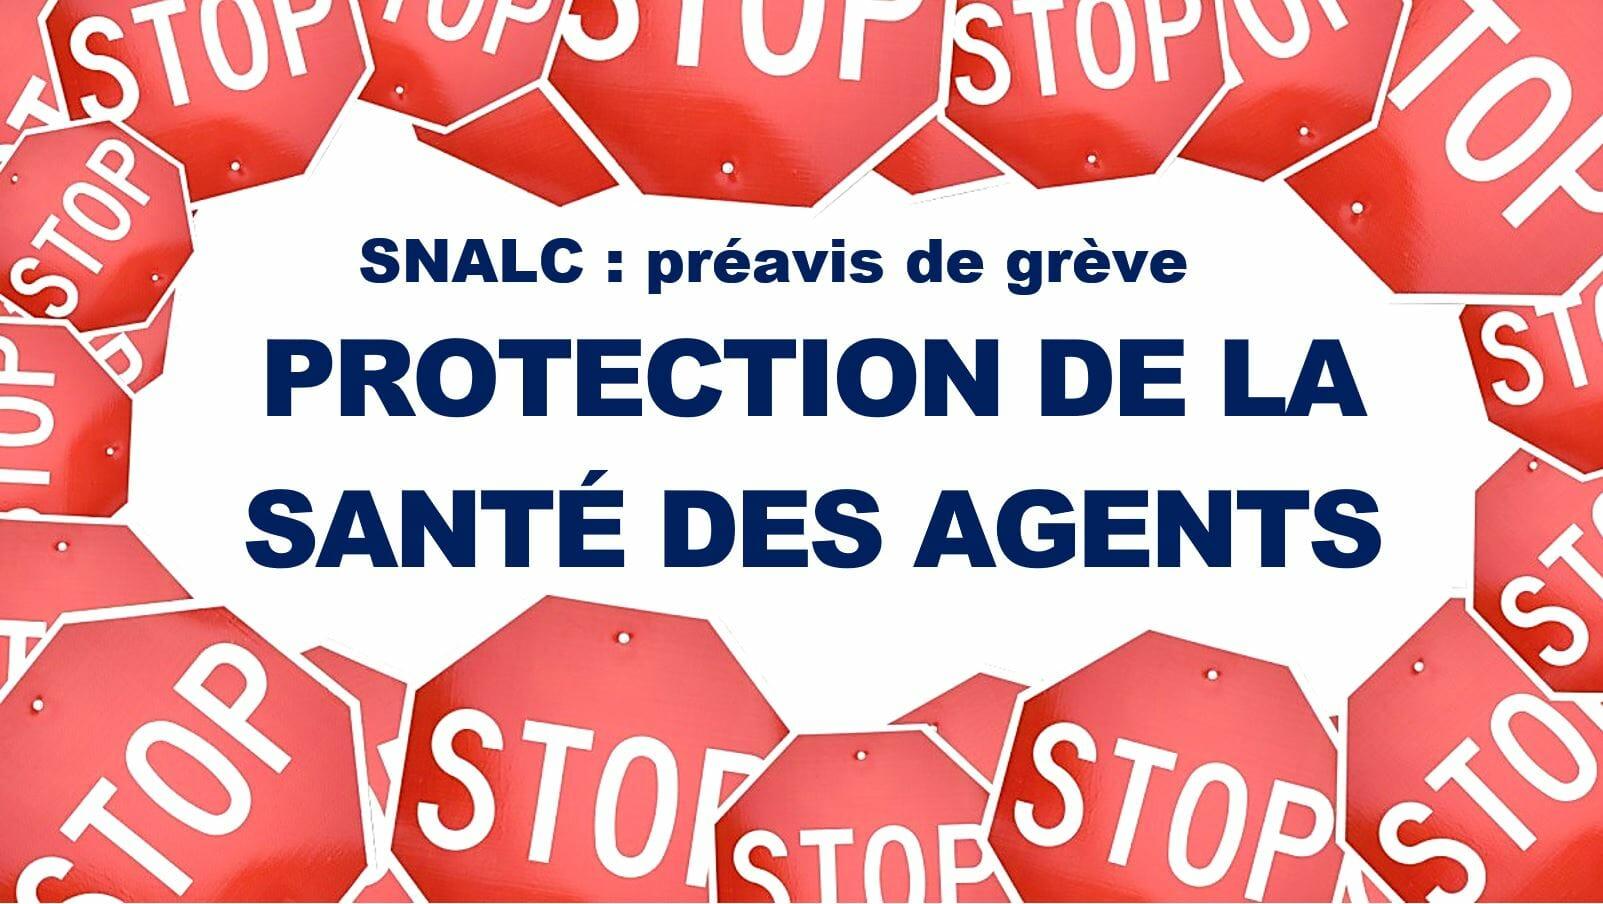 greve_sante_protection